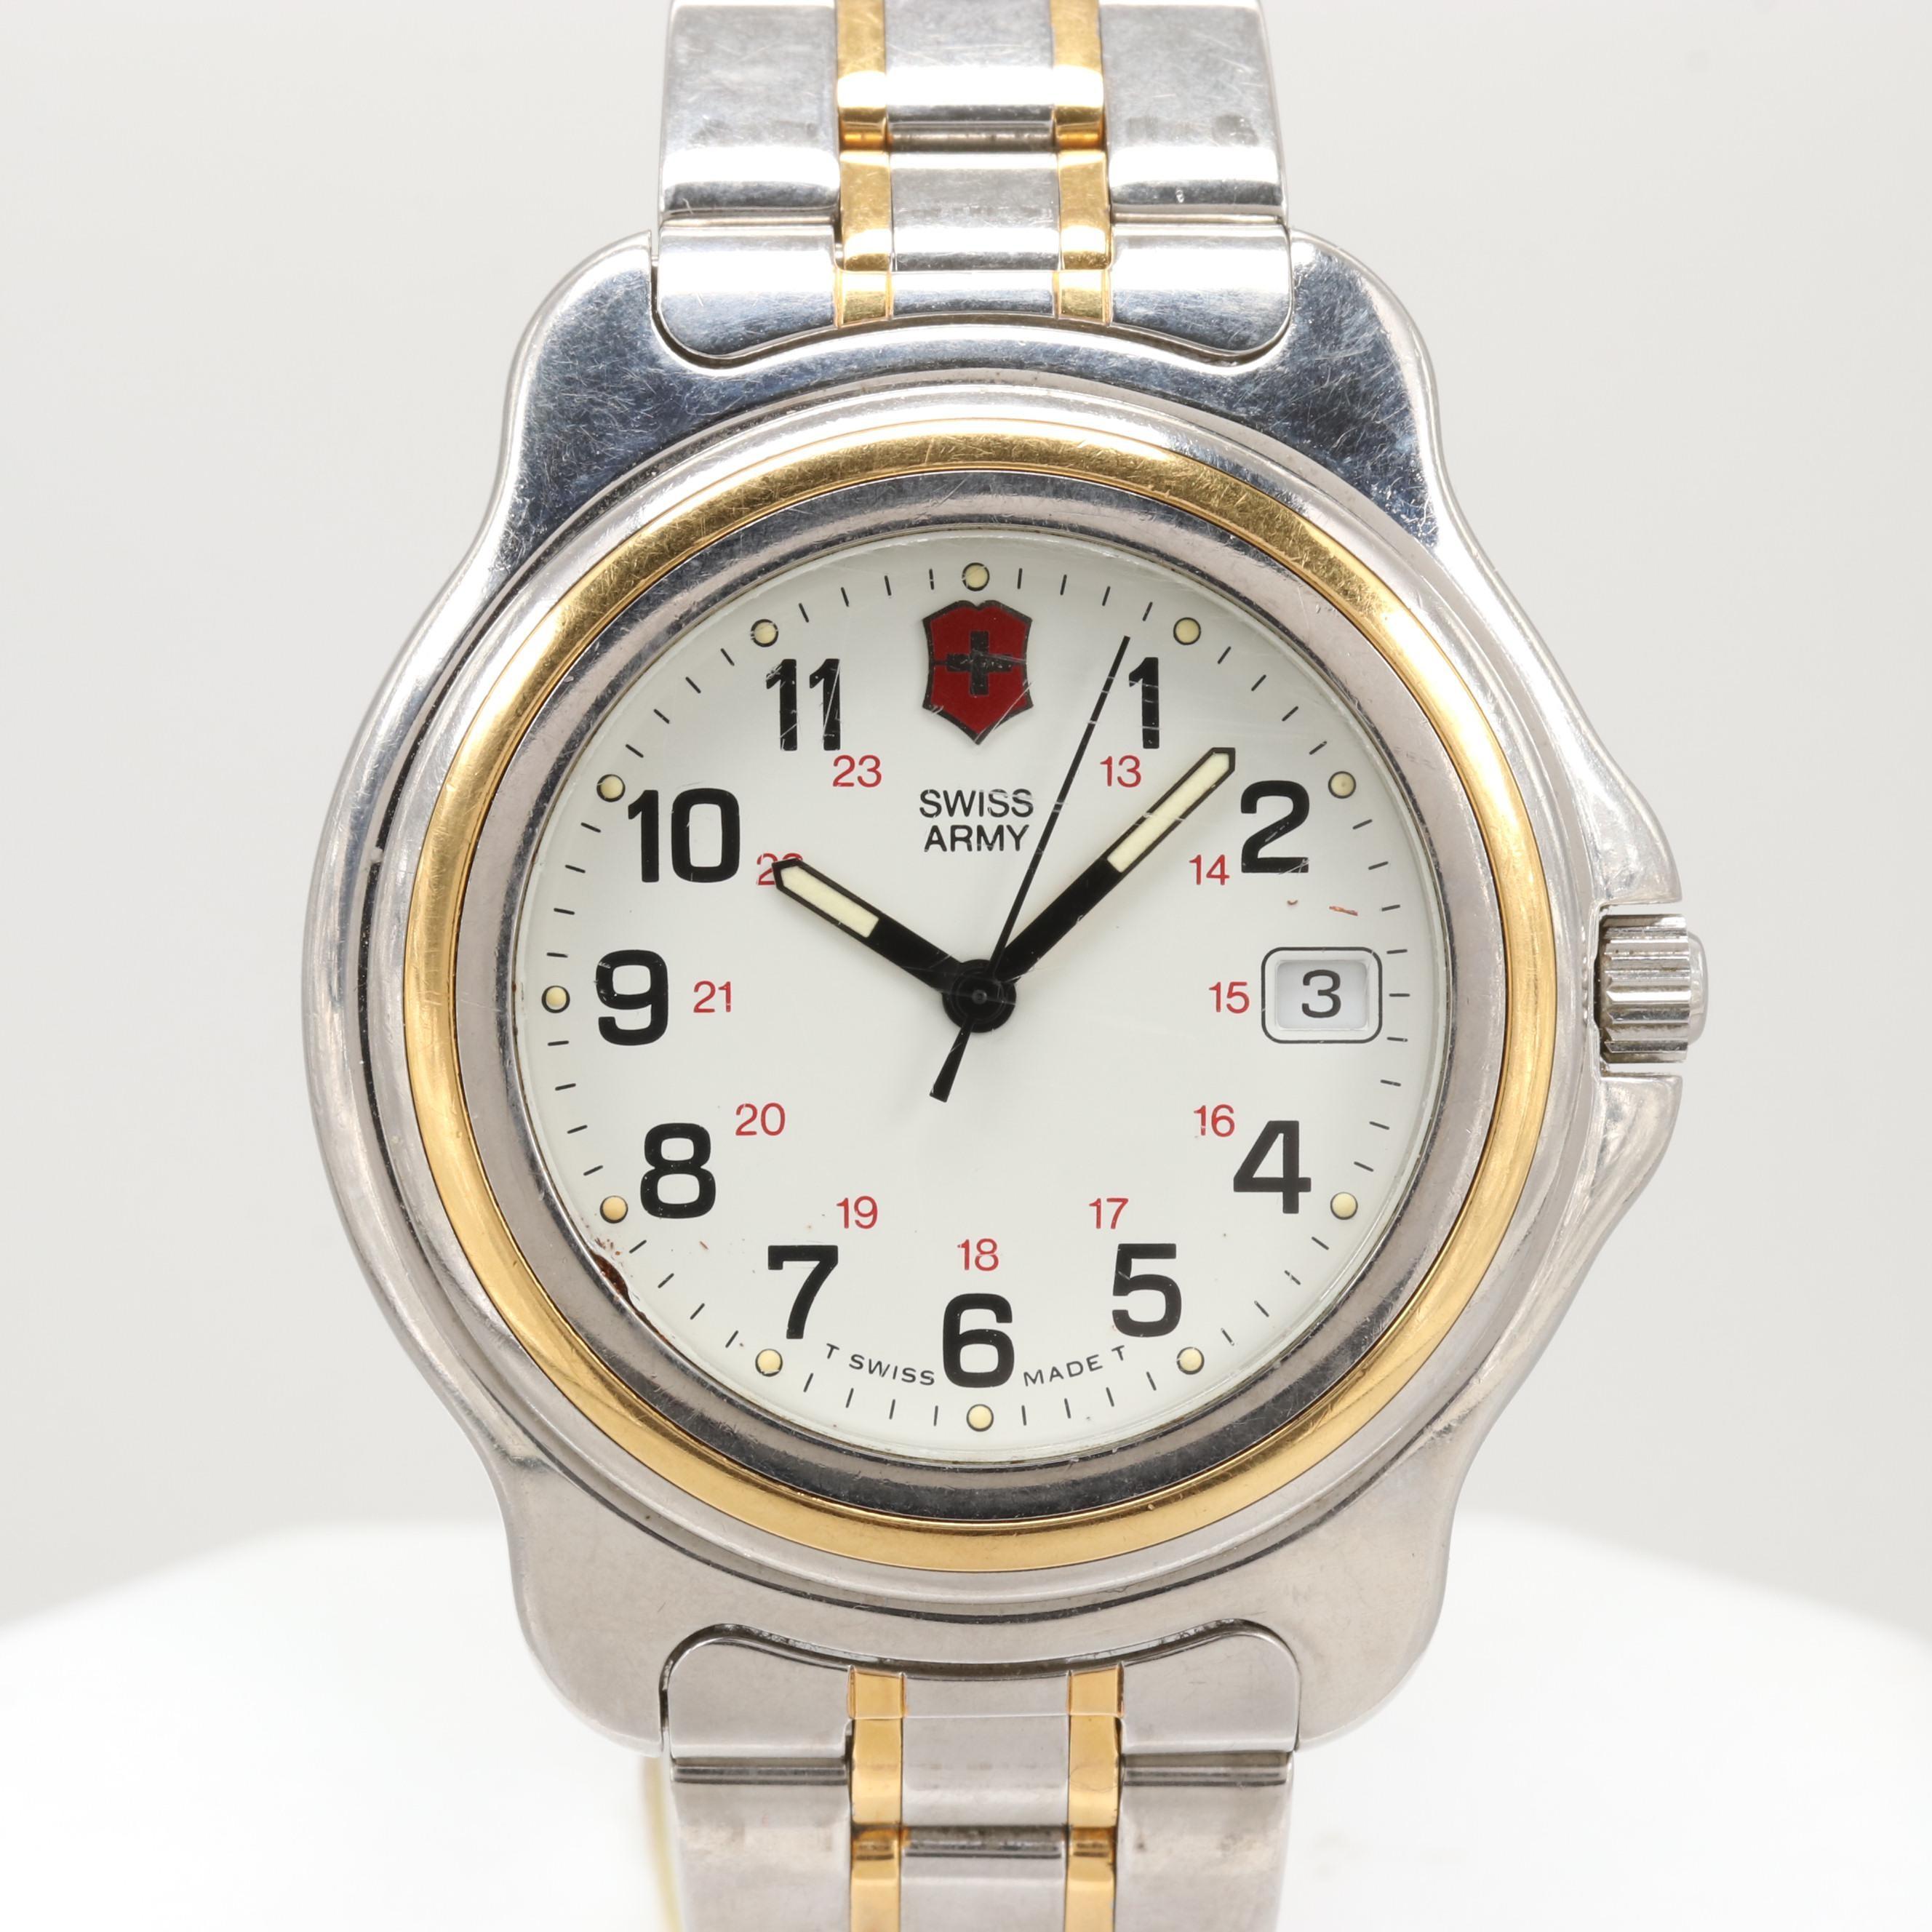 Swiss Army Two Tone Stainless Steel Wristwatch With Date Window